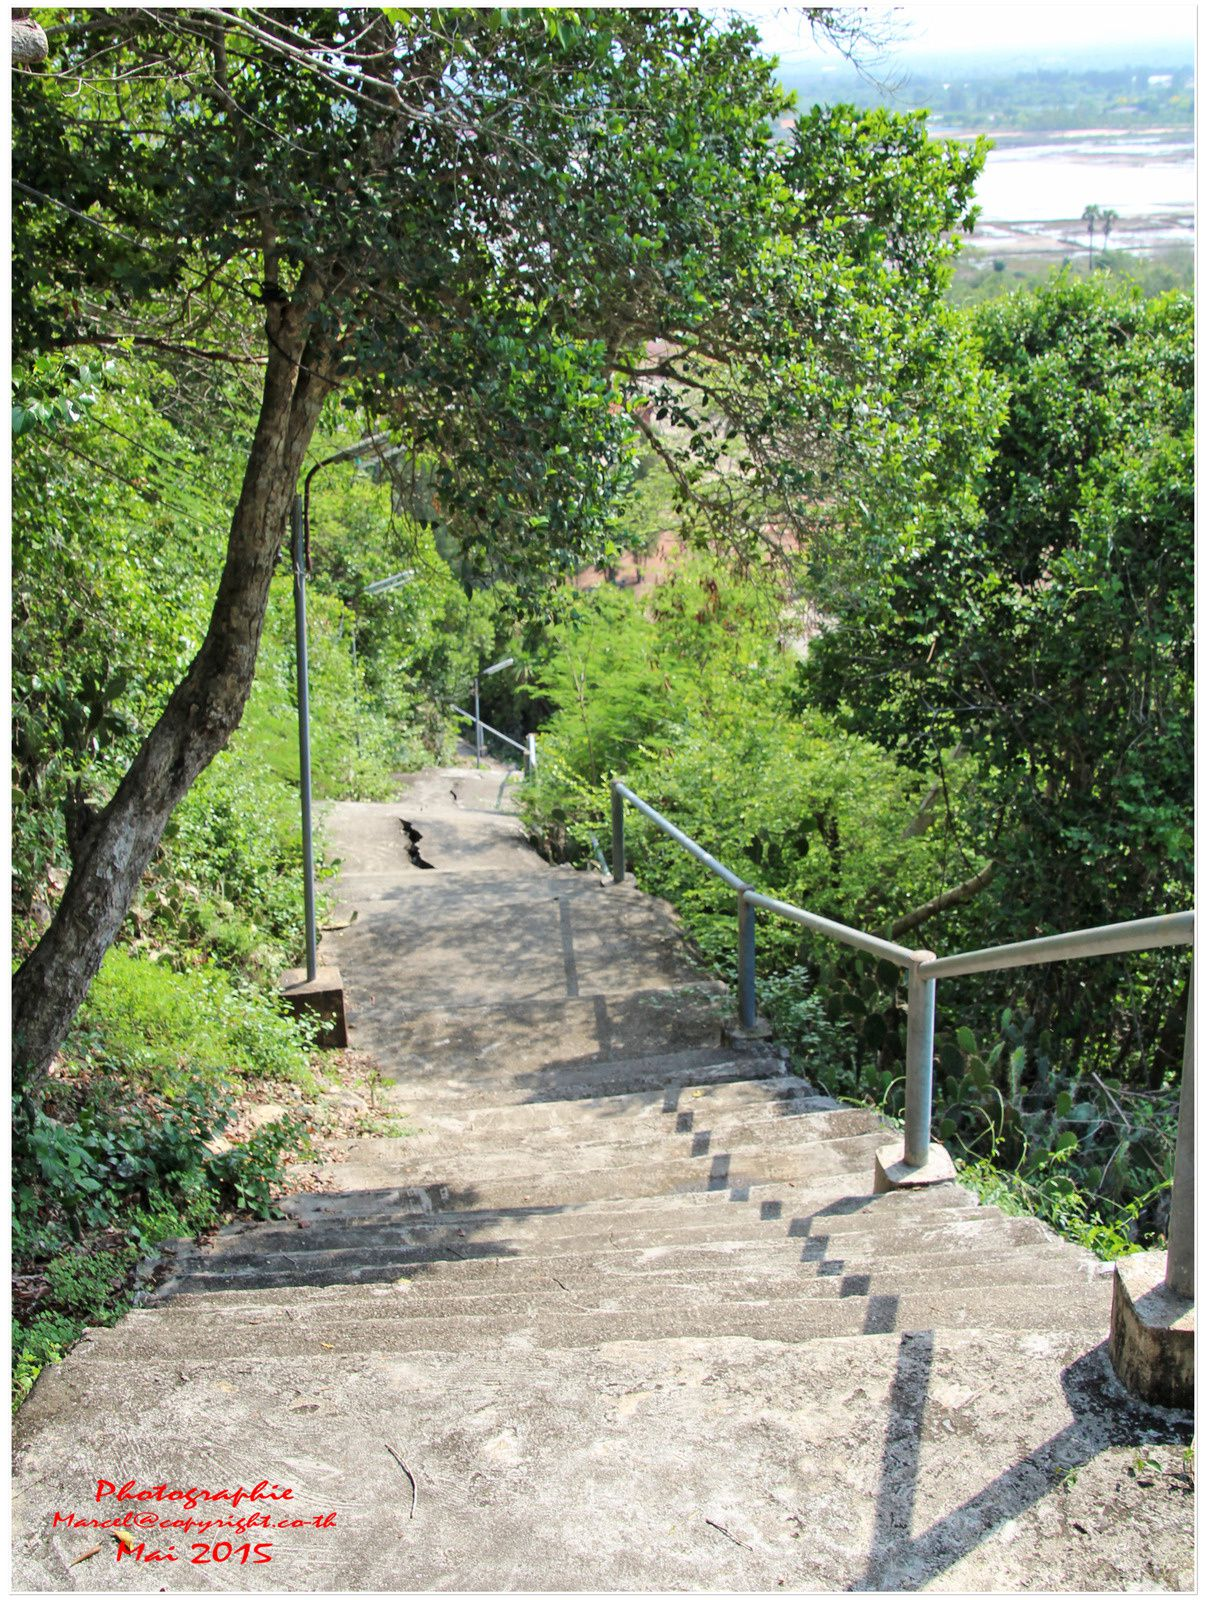 La grotte de &quot&#x3B;Tham Phra Nawn&quot&#x3B; à Prachuap Kiri Khan (II)